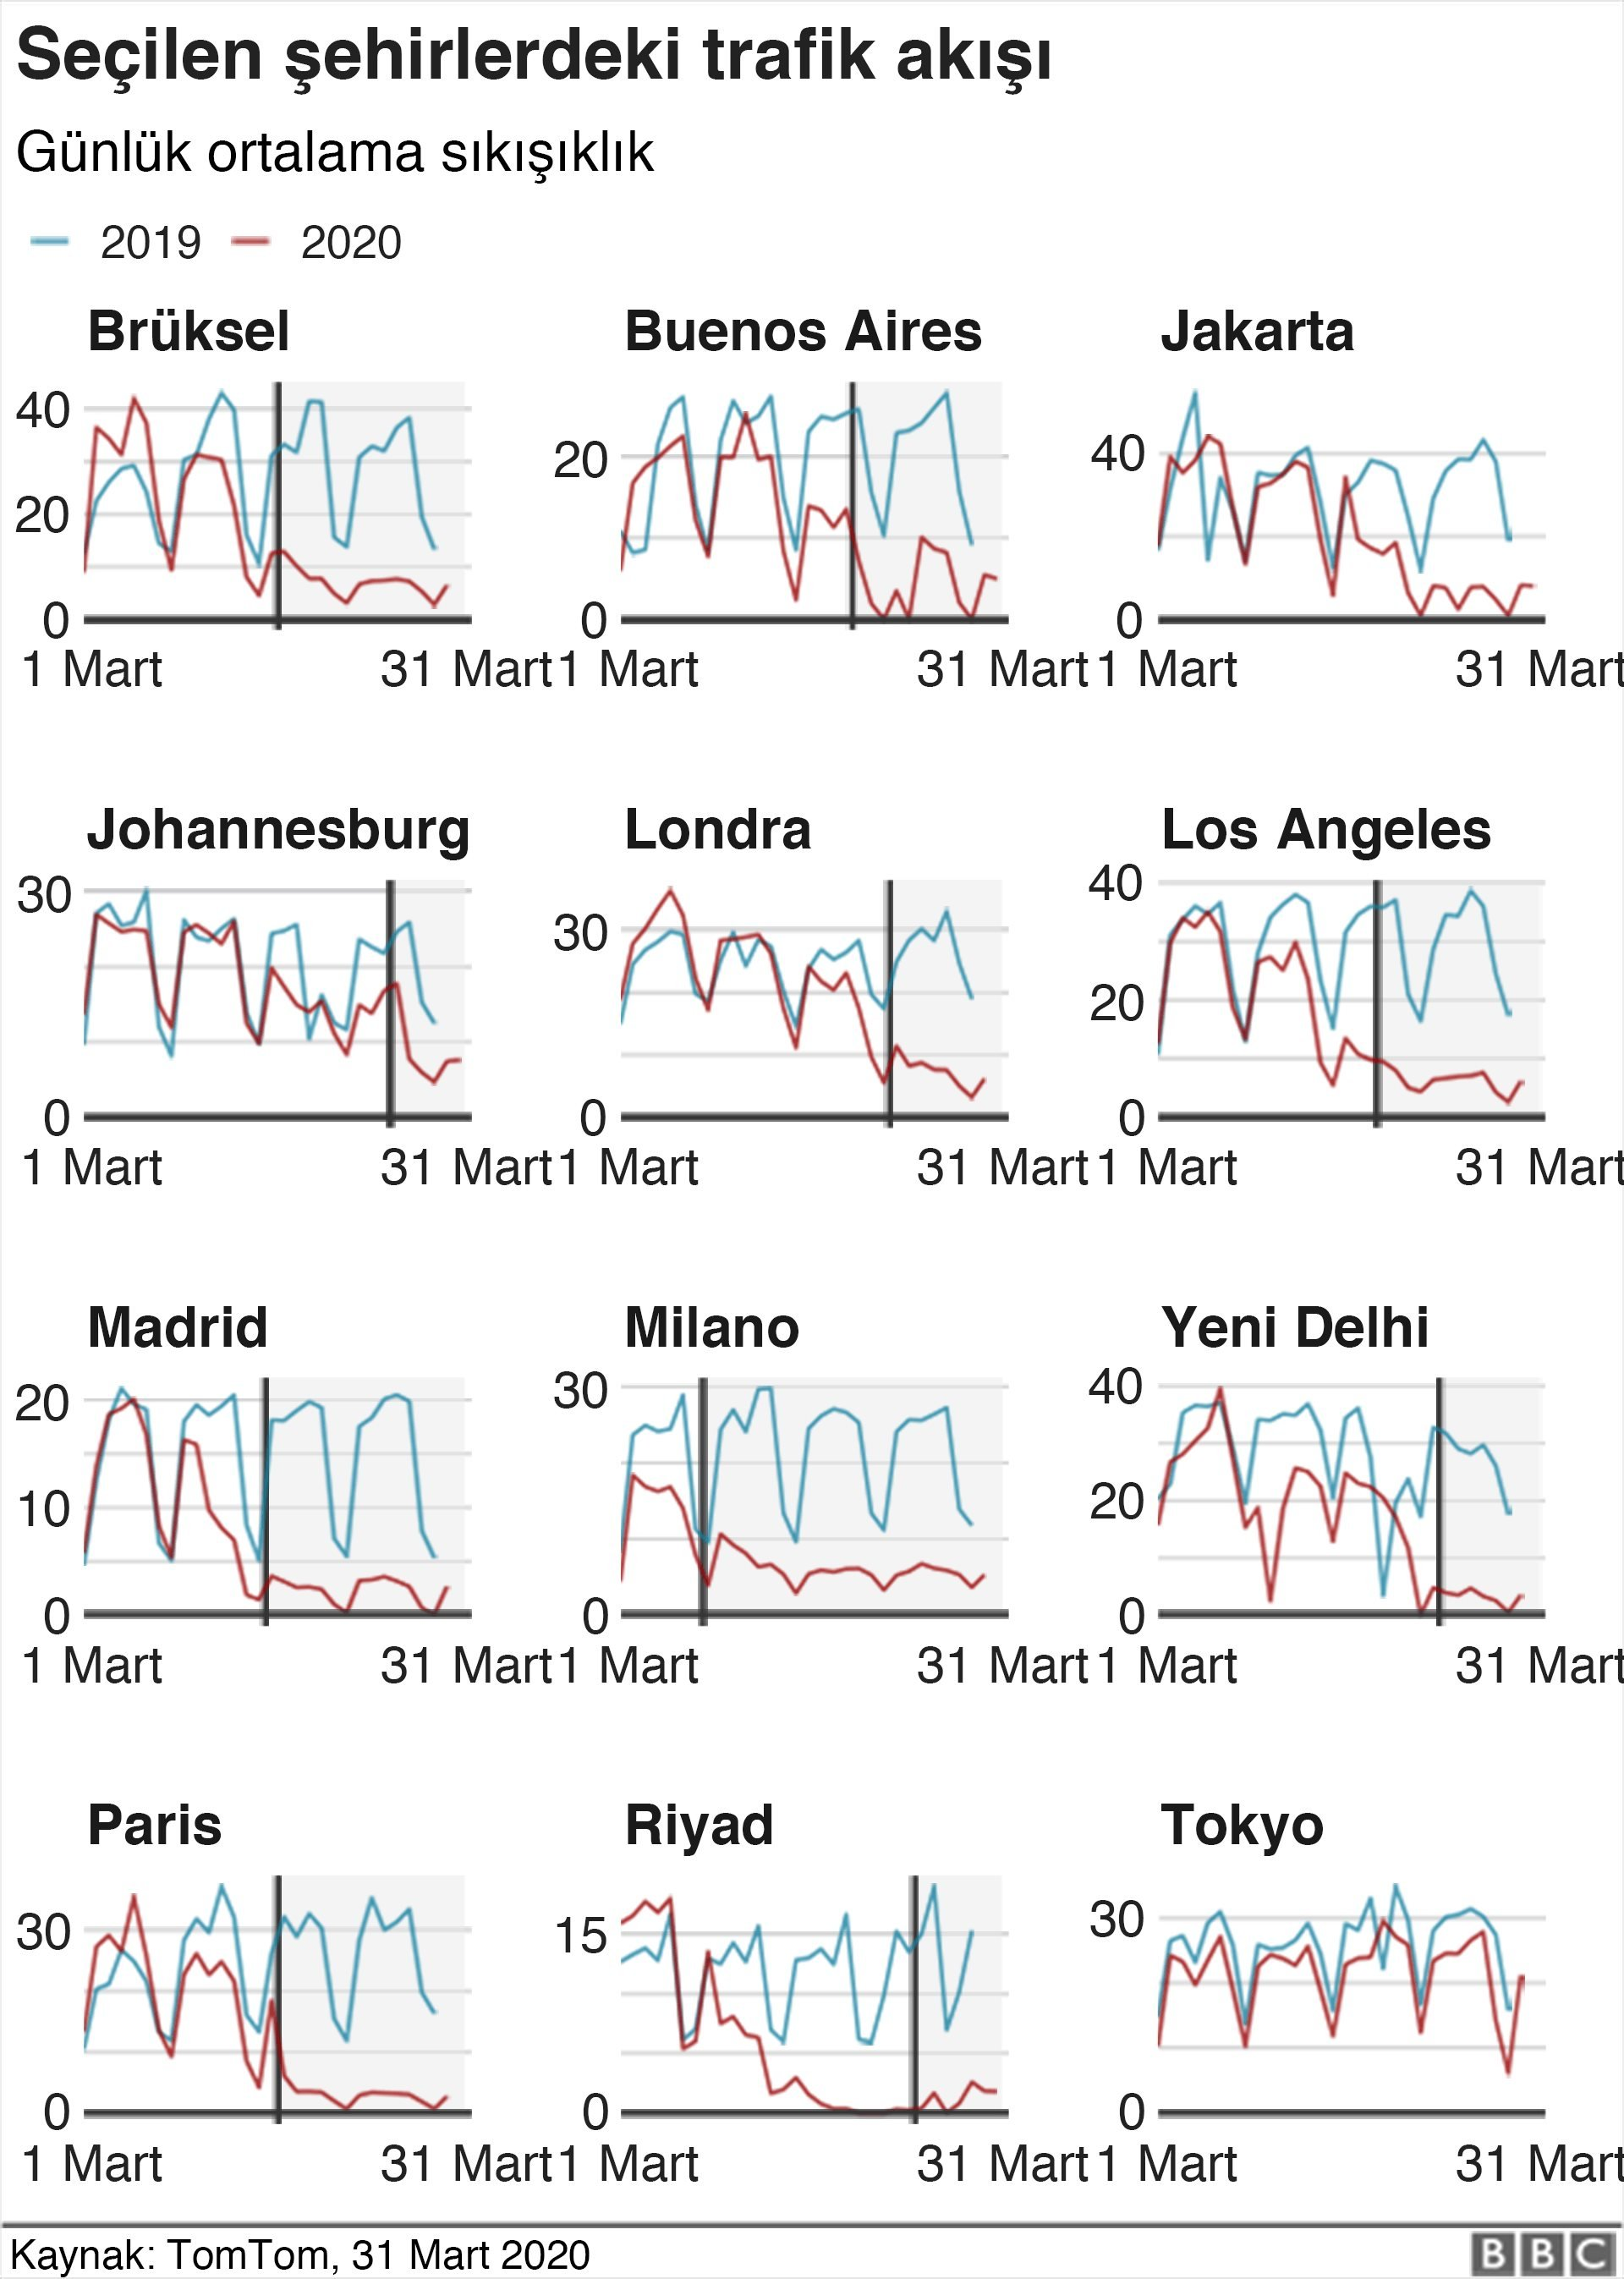 Şehirlerde trafik akışı